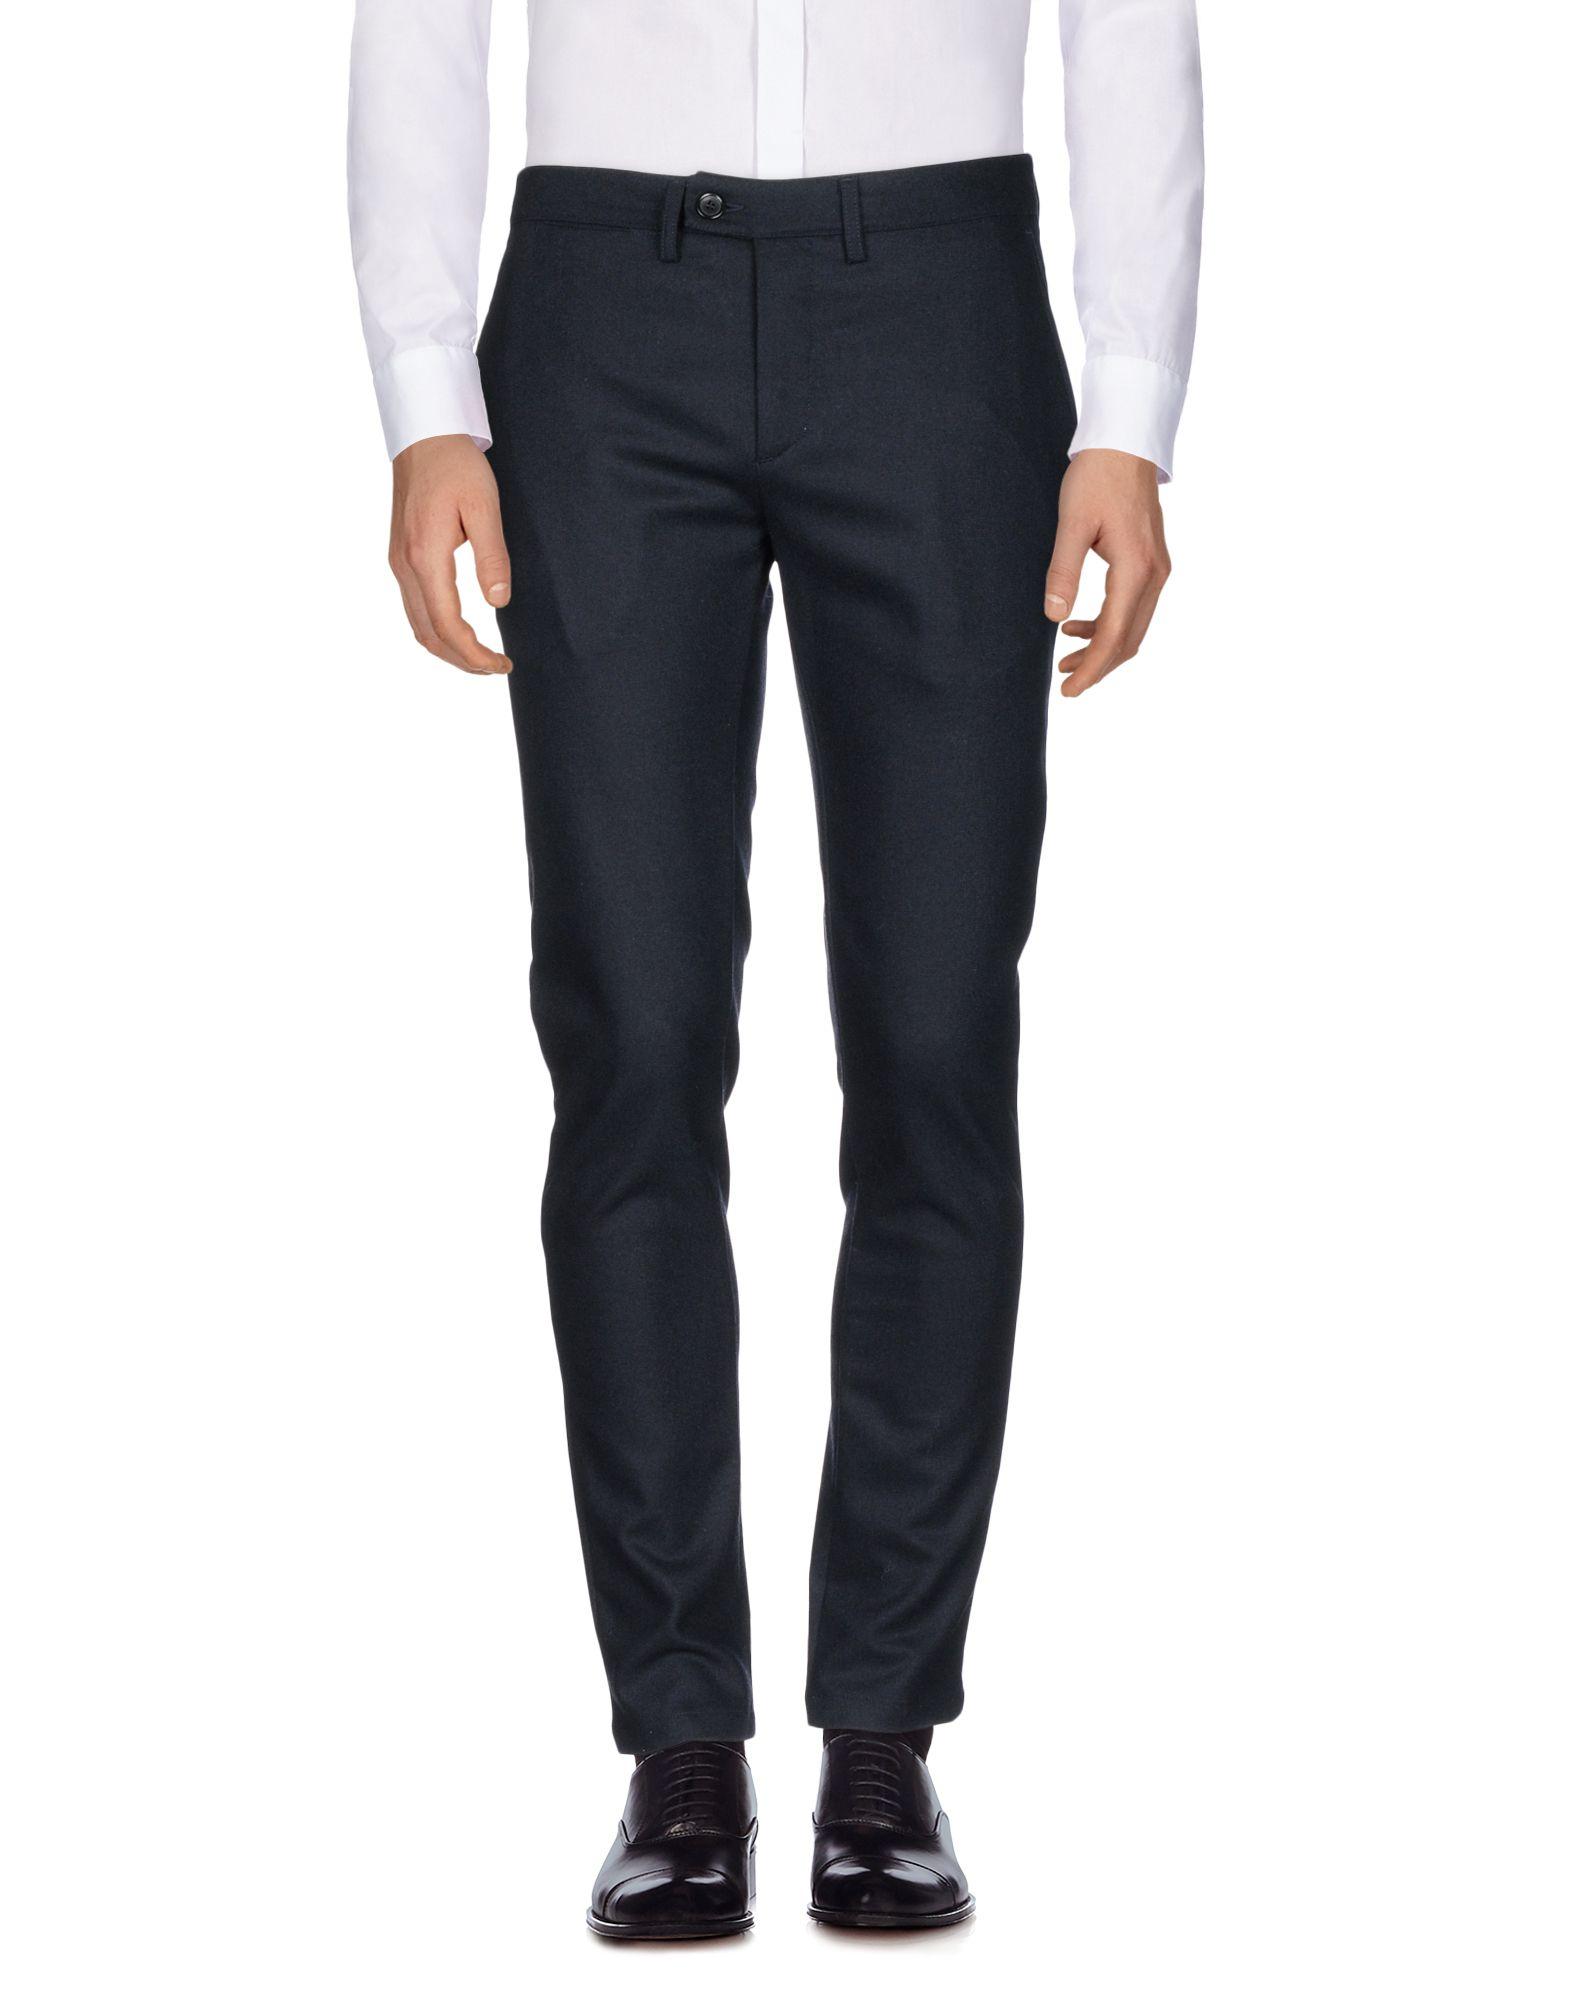 Pantalone Department 5 Donna - Acquista online su